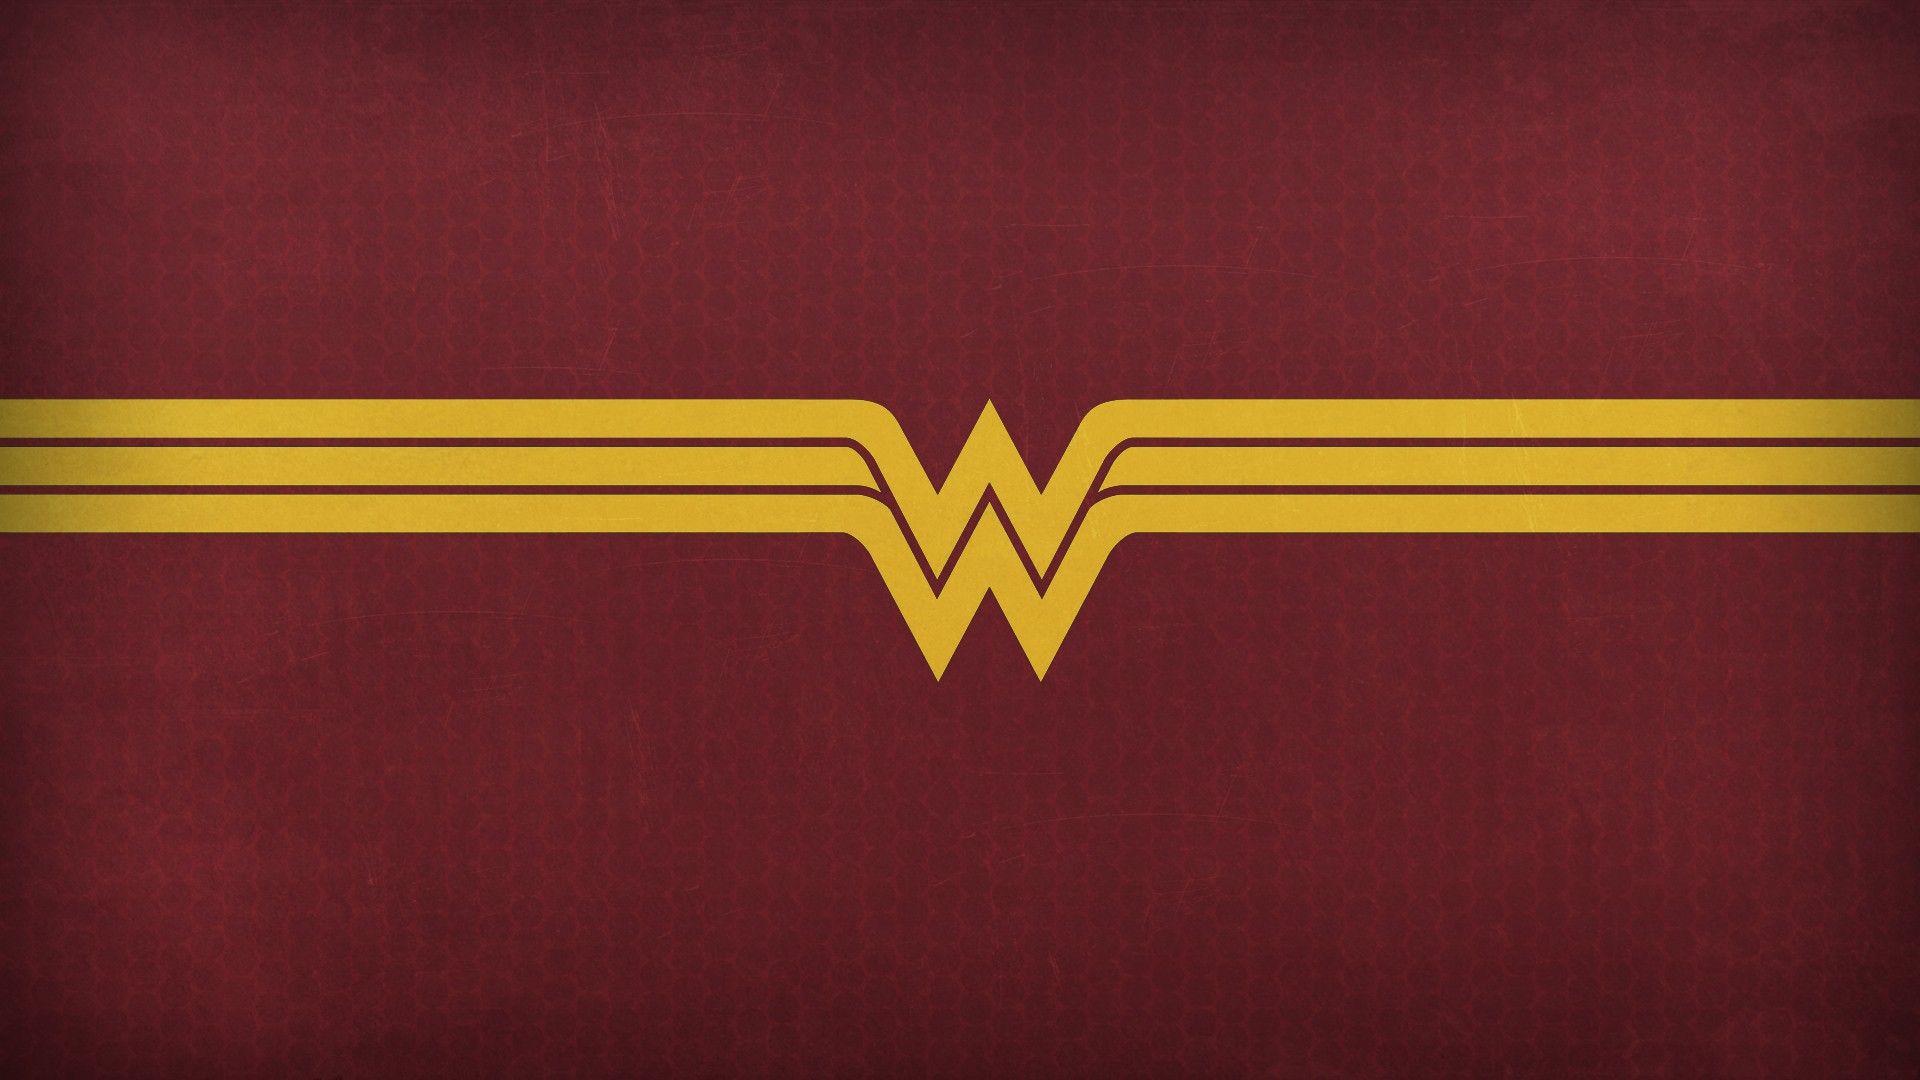 Wonder Woman Logo Wallpaper Pictures to Pin on Pinterest